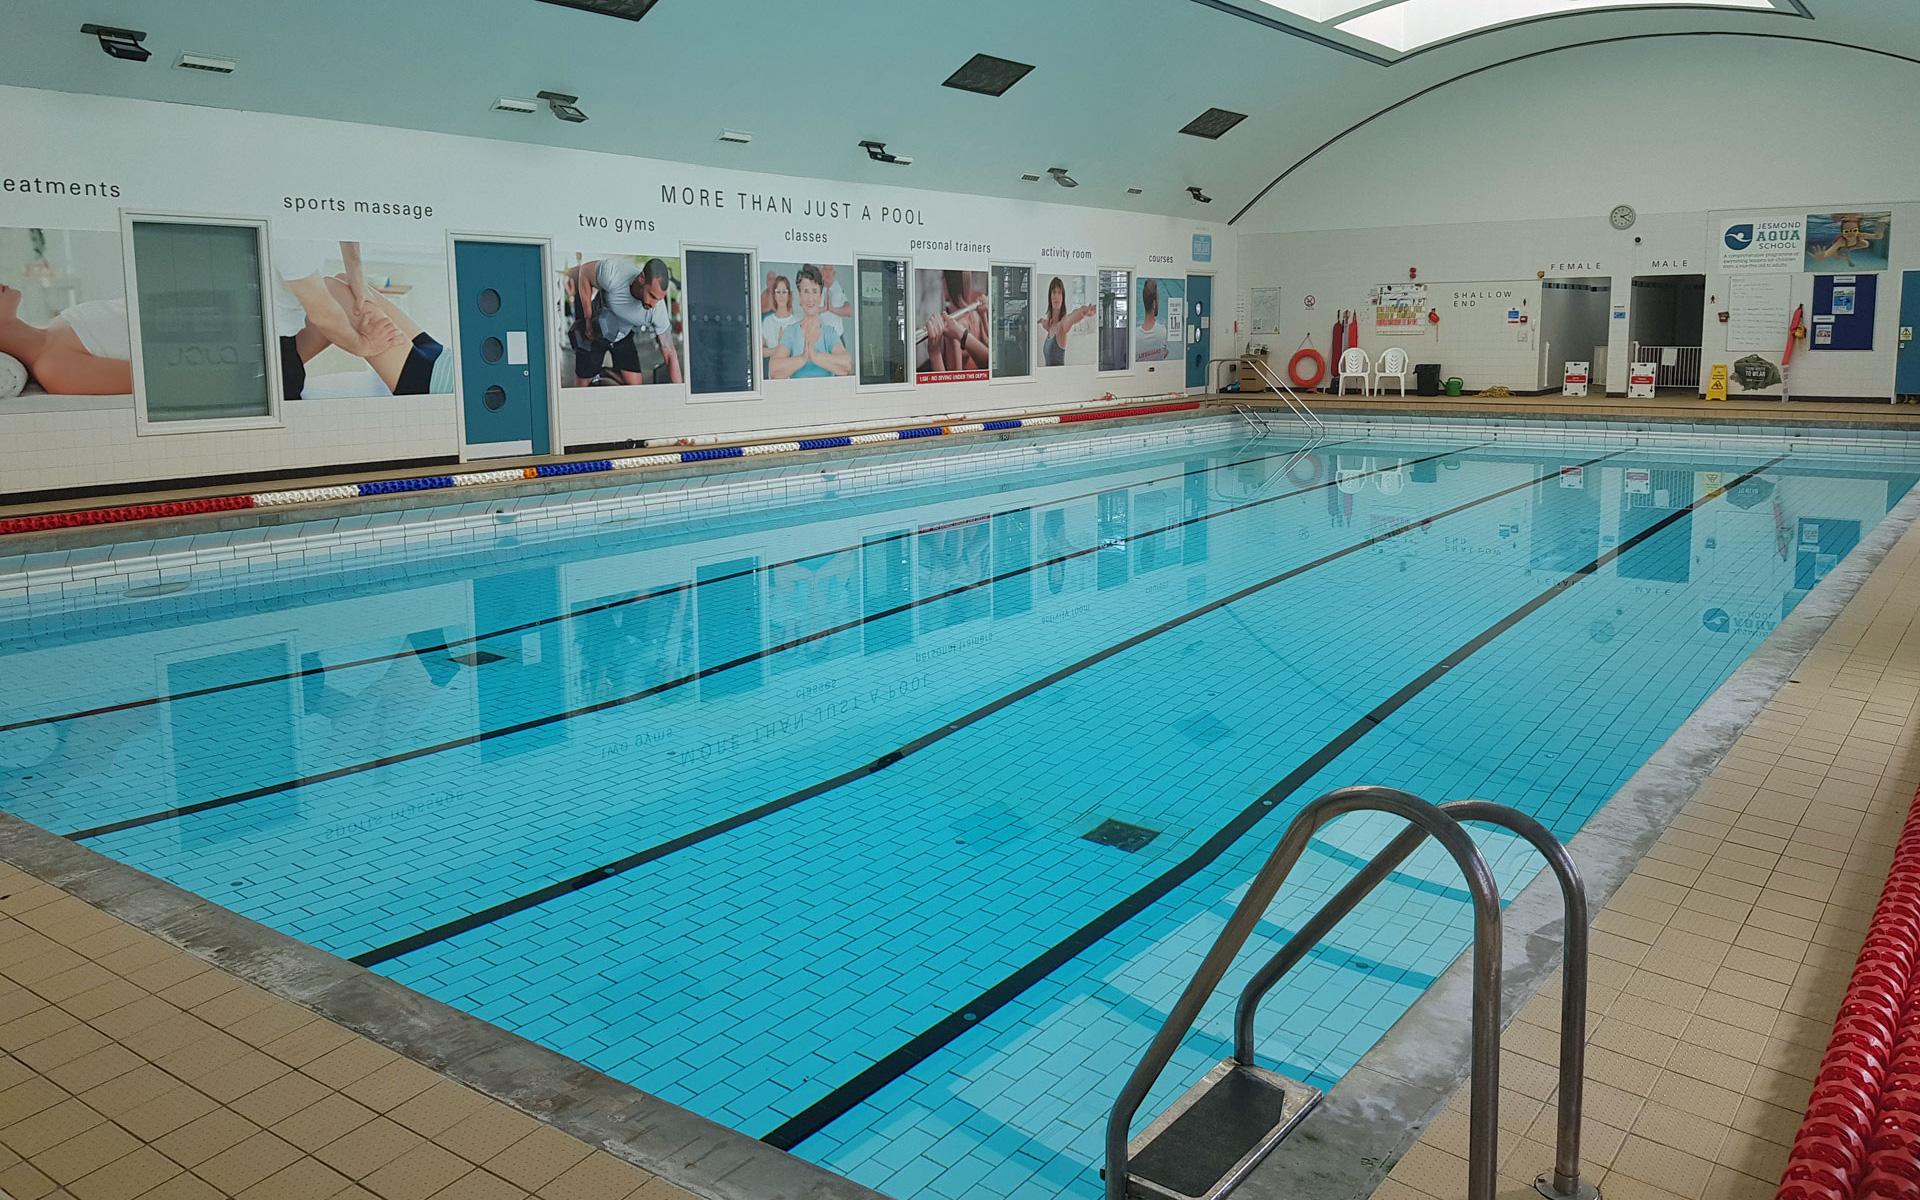 Jesmond Pool and Gym